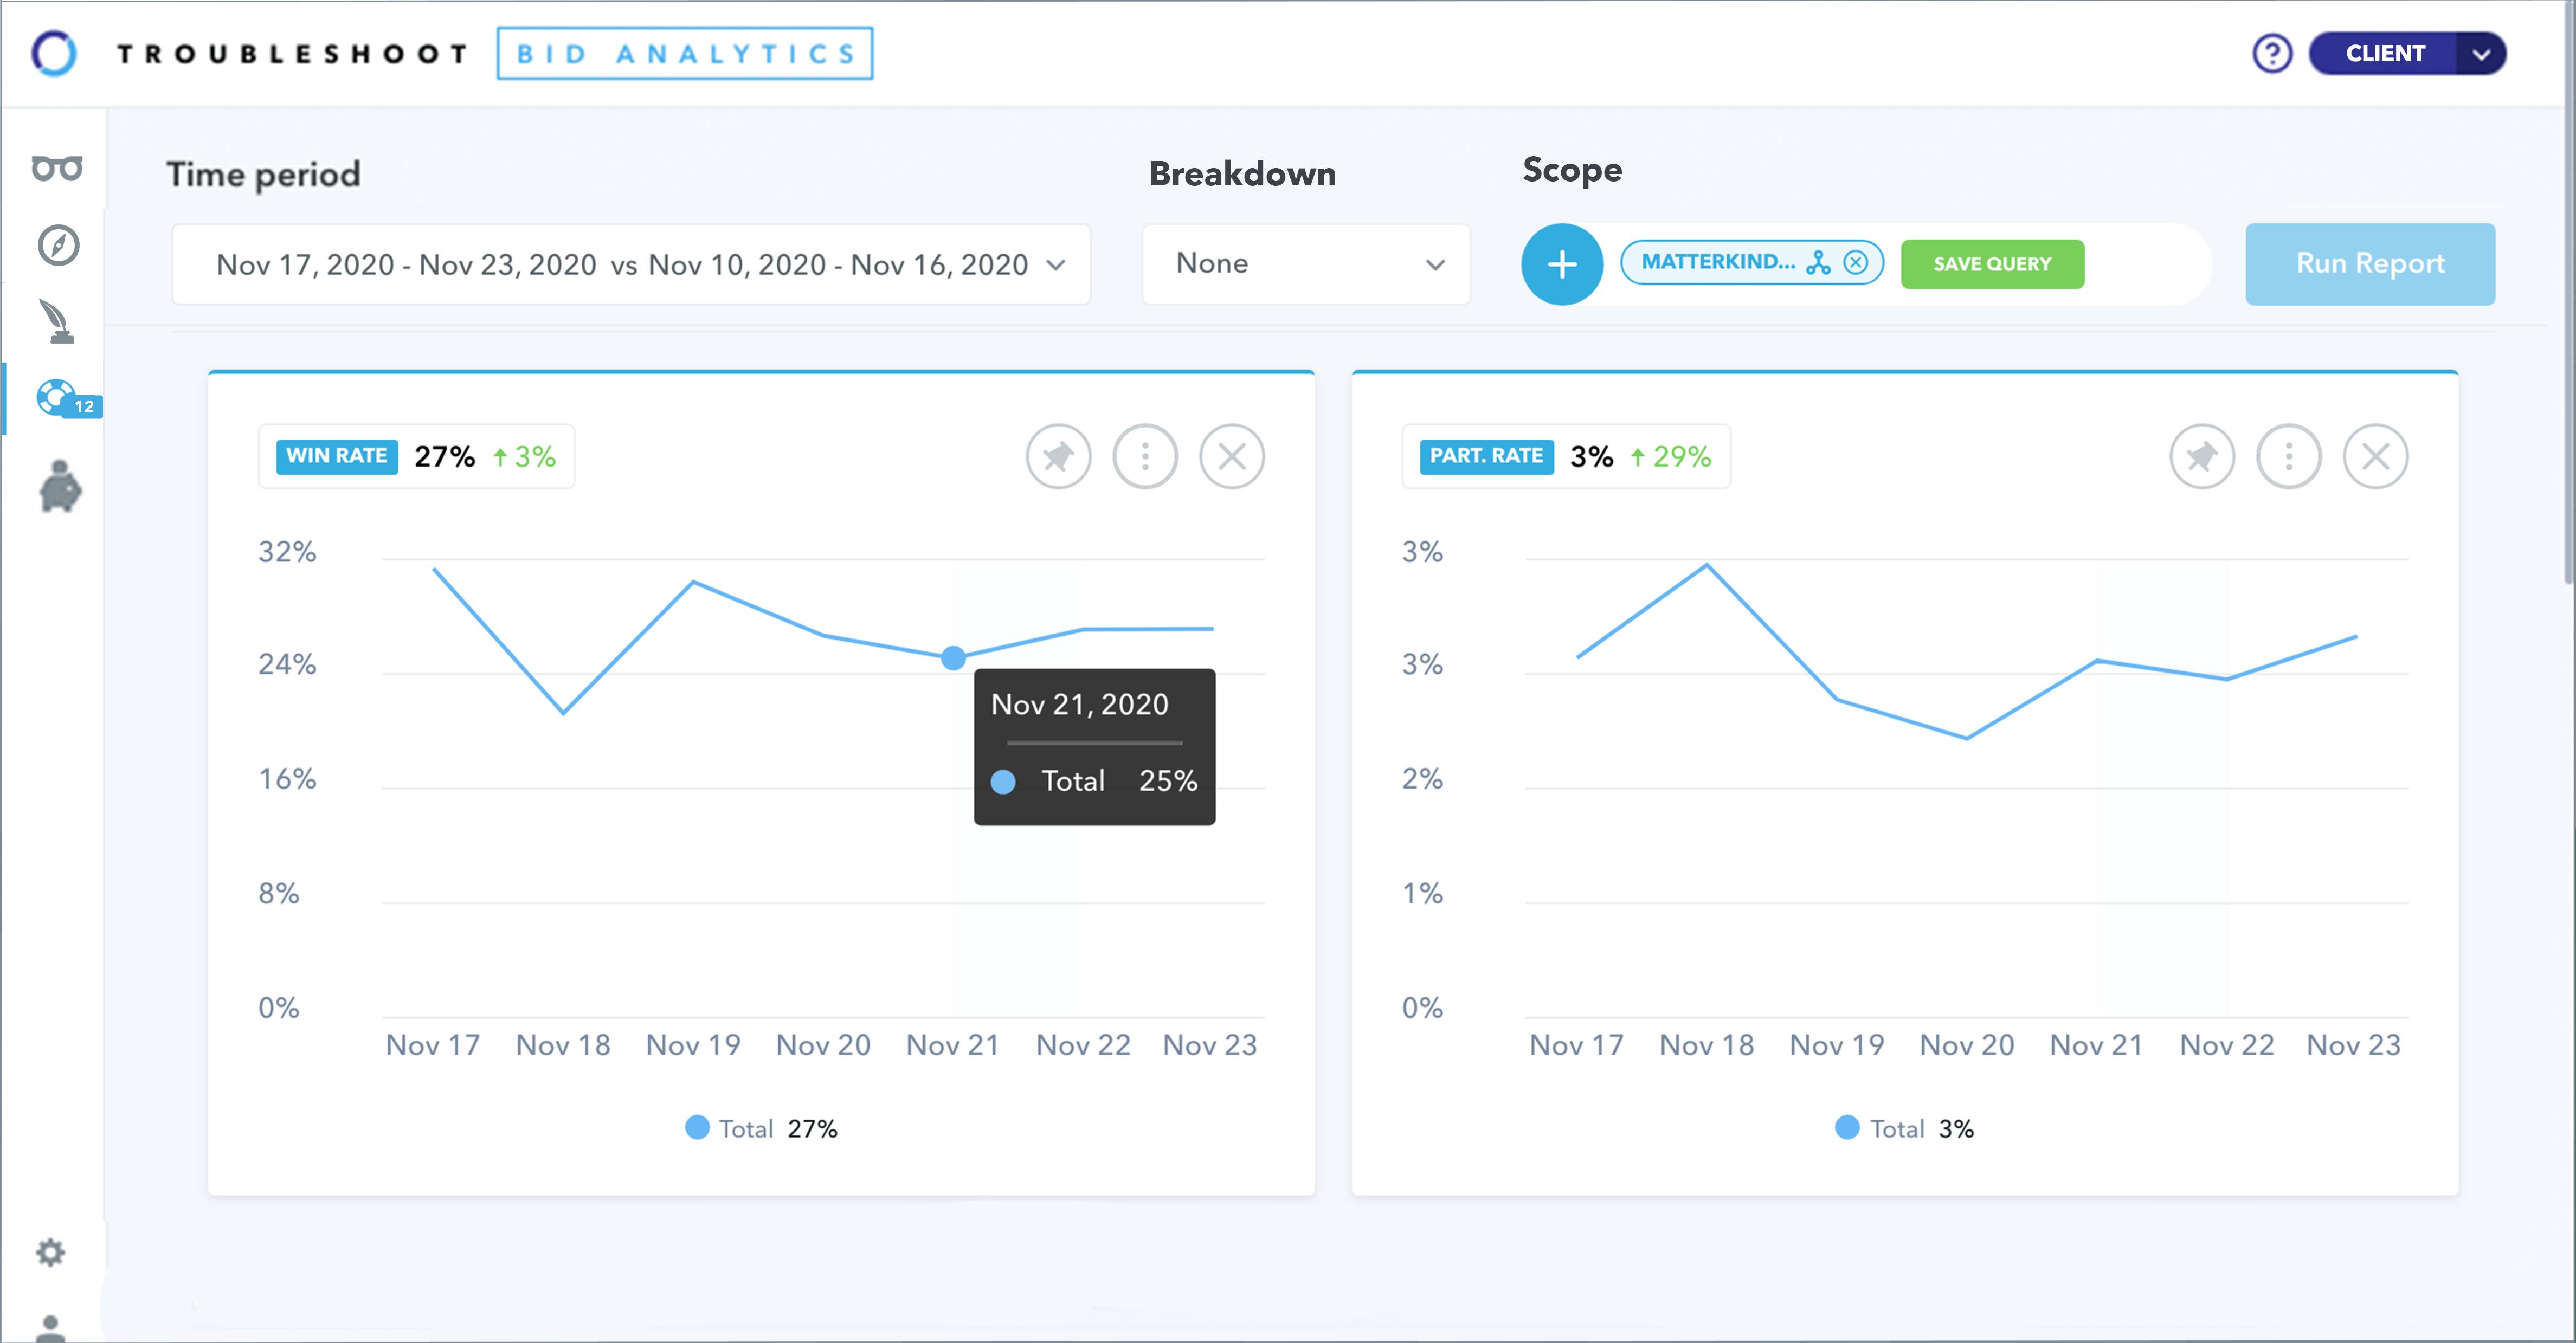 Adomik_Troubleshoot_UI_image_Charts